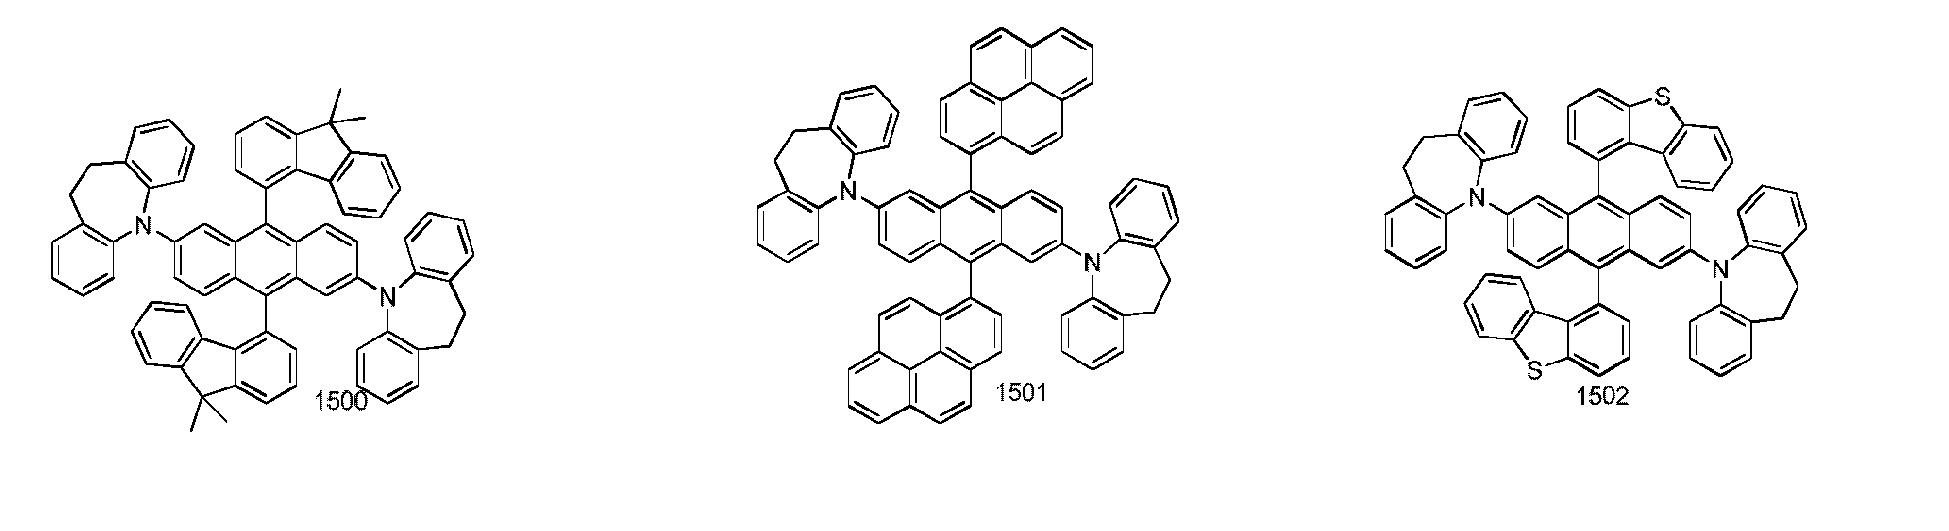 Figure imgb0238